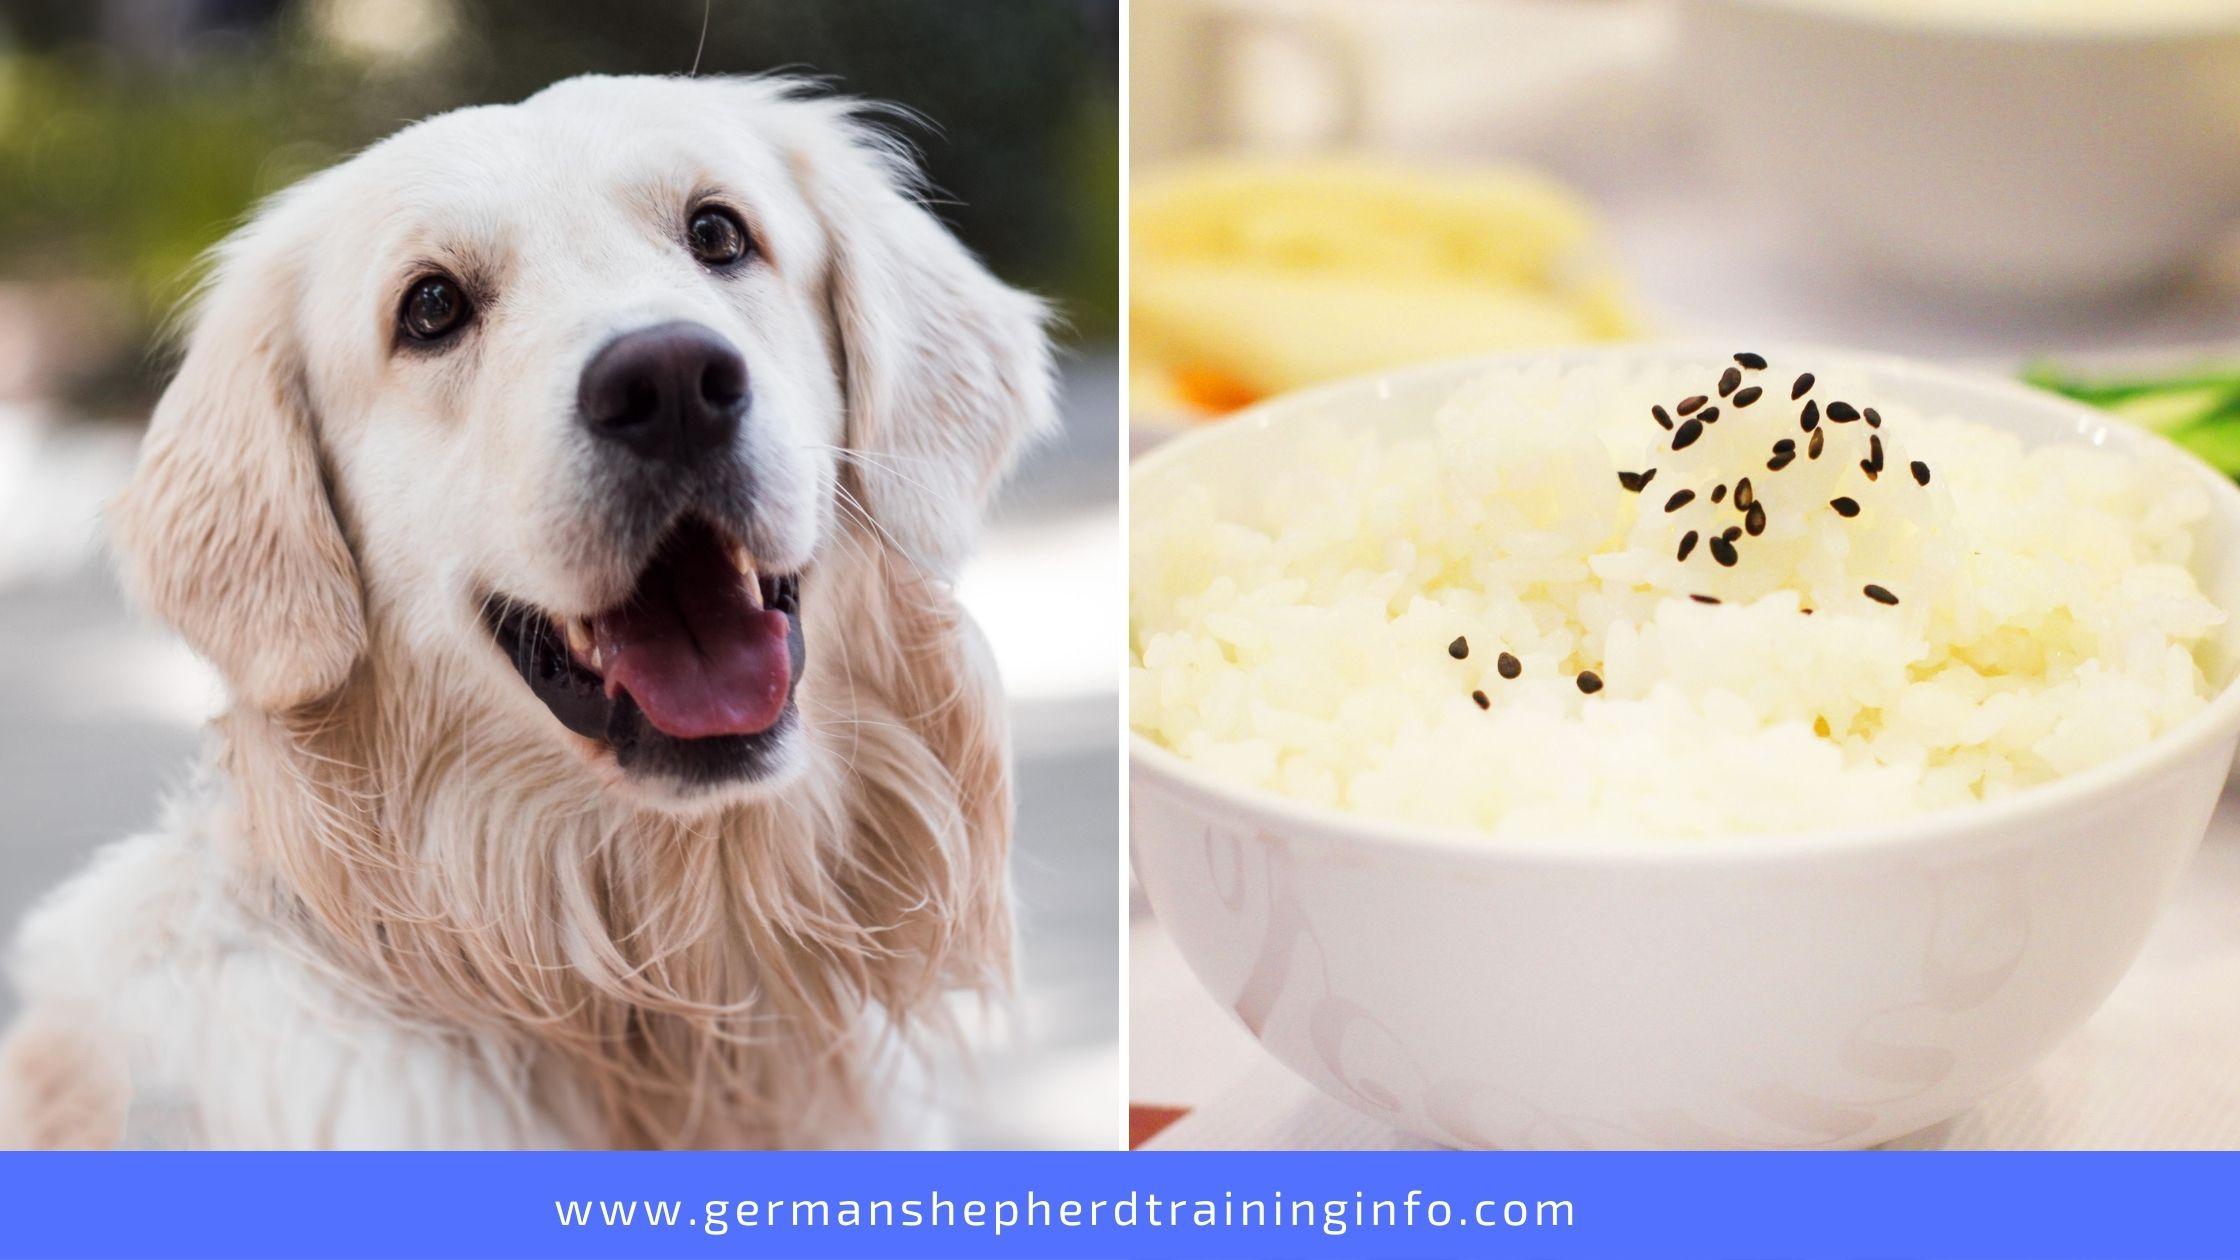 Can Dogs Eat Jasmine Rice?